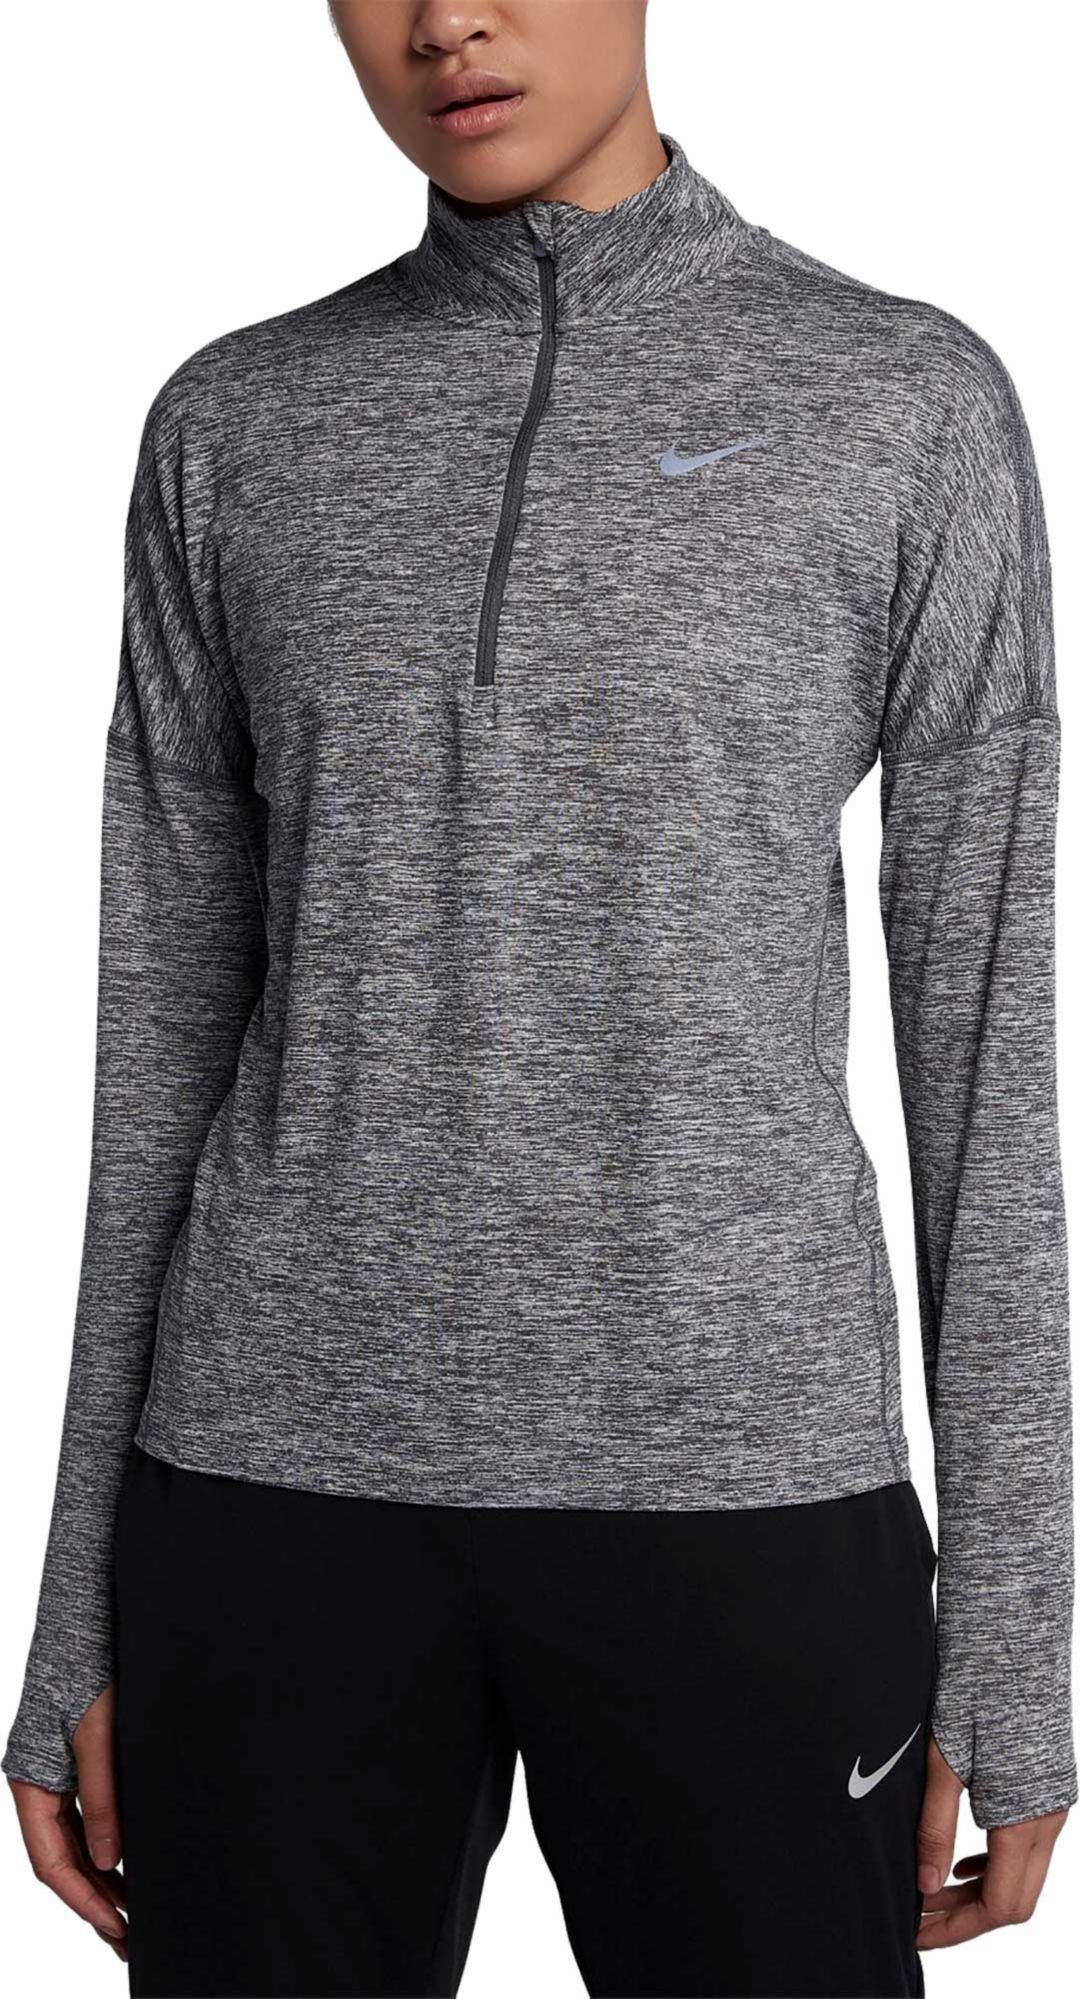 2bfb1b81e237 Nike Women's Dry Element Half Zip Long Sleeve Running Shirt | DICK'S  Sporting Goods